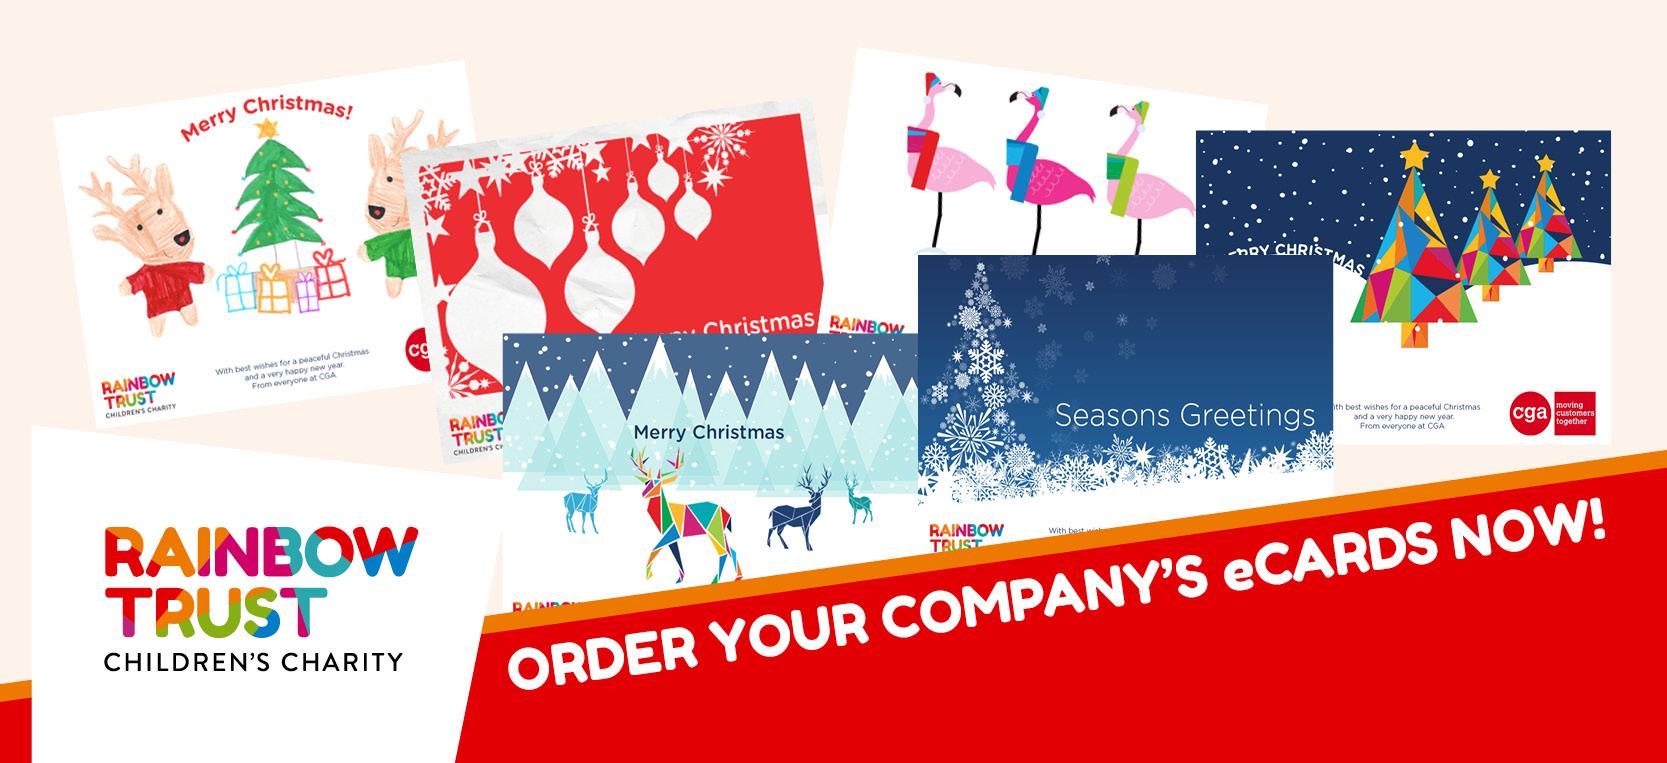 Send a festive eCard